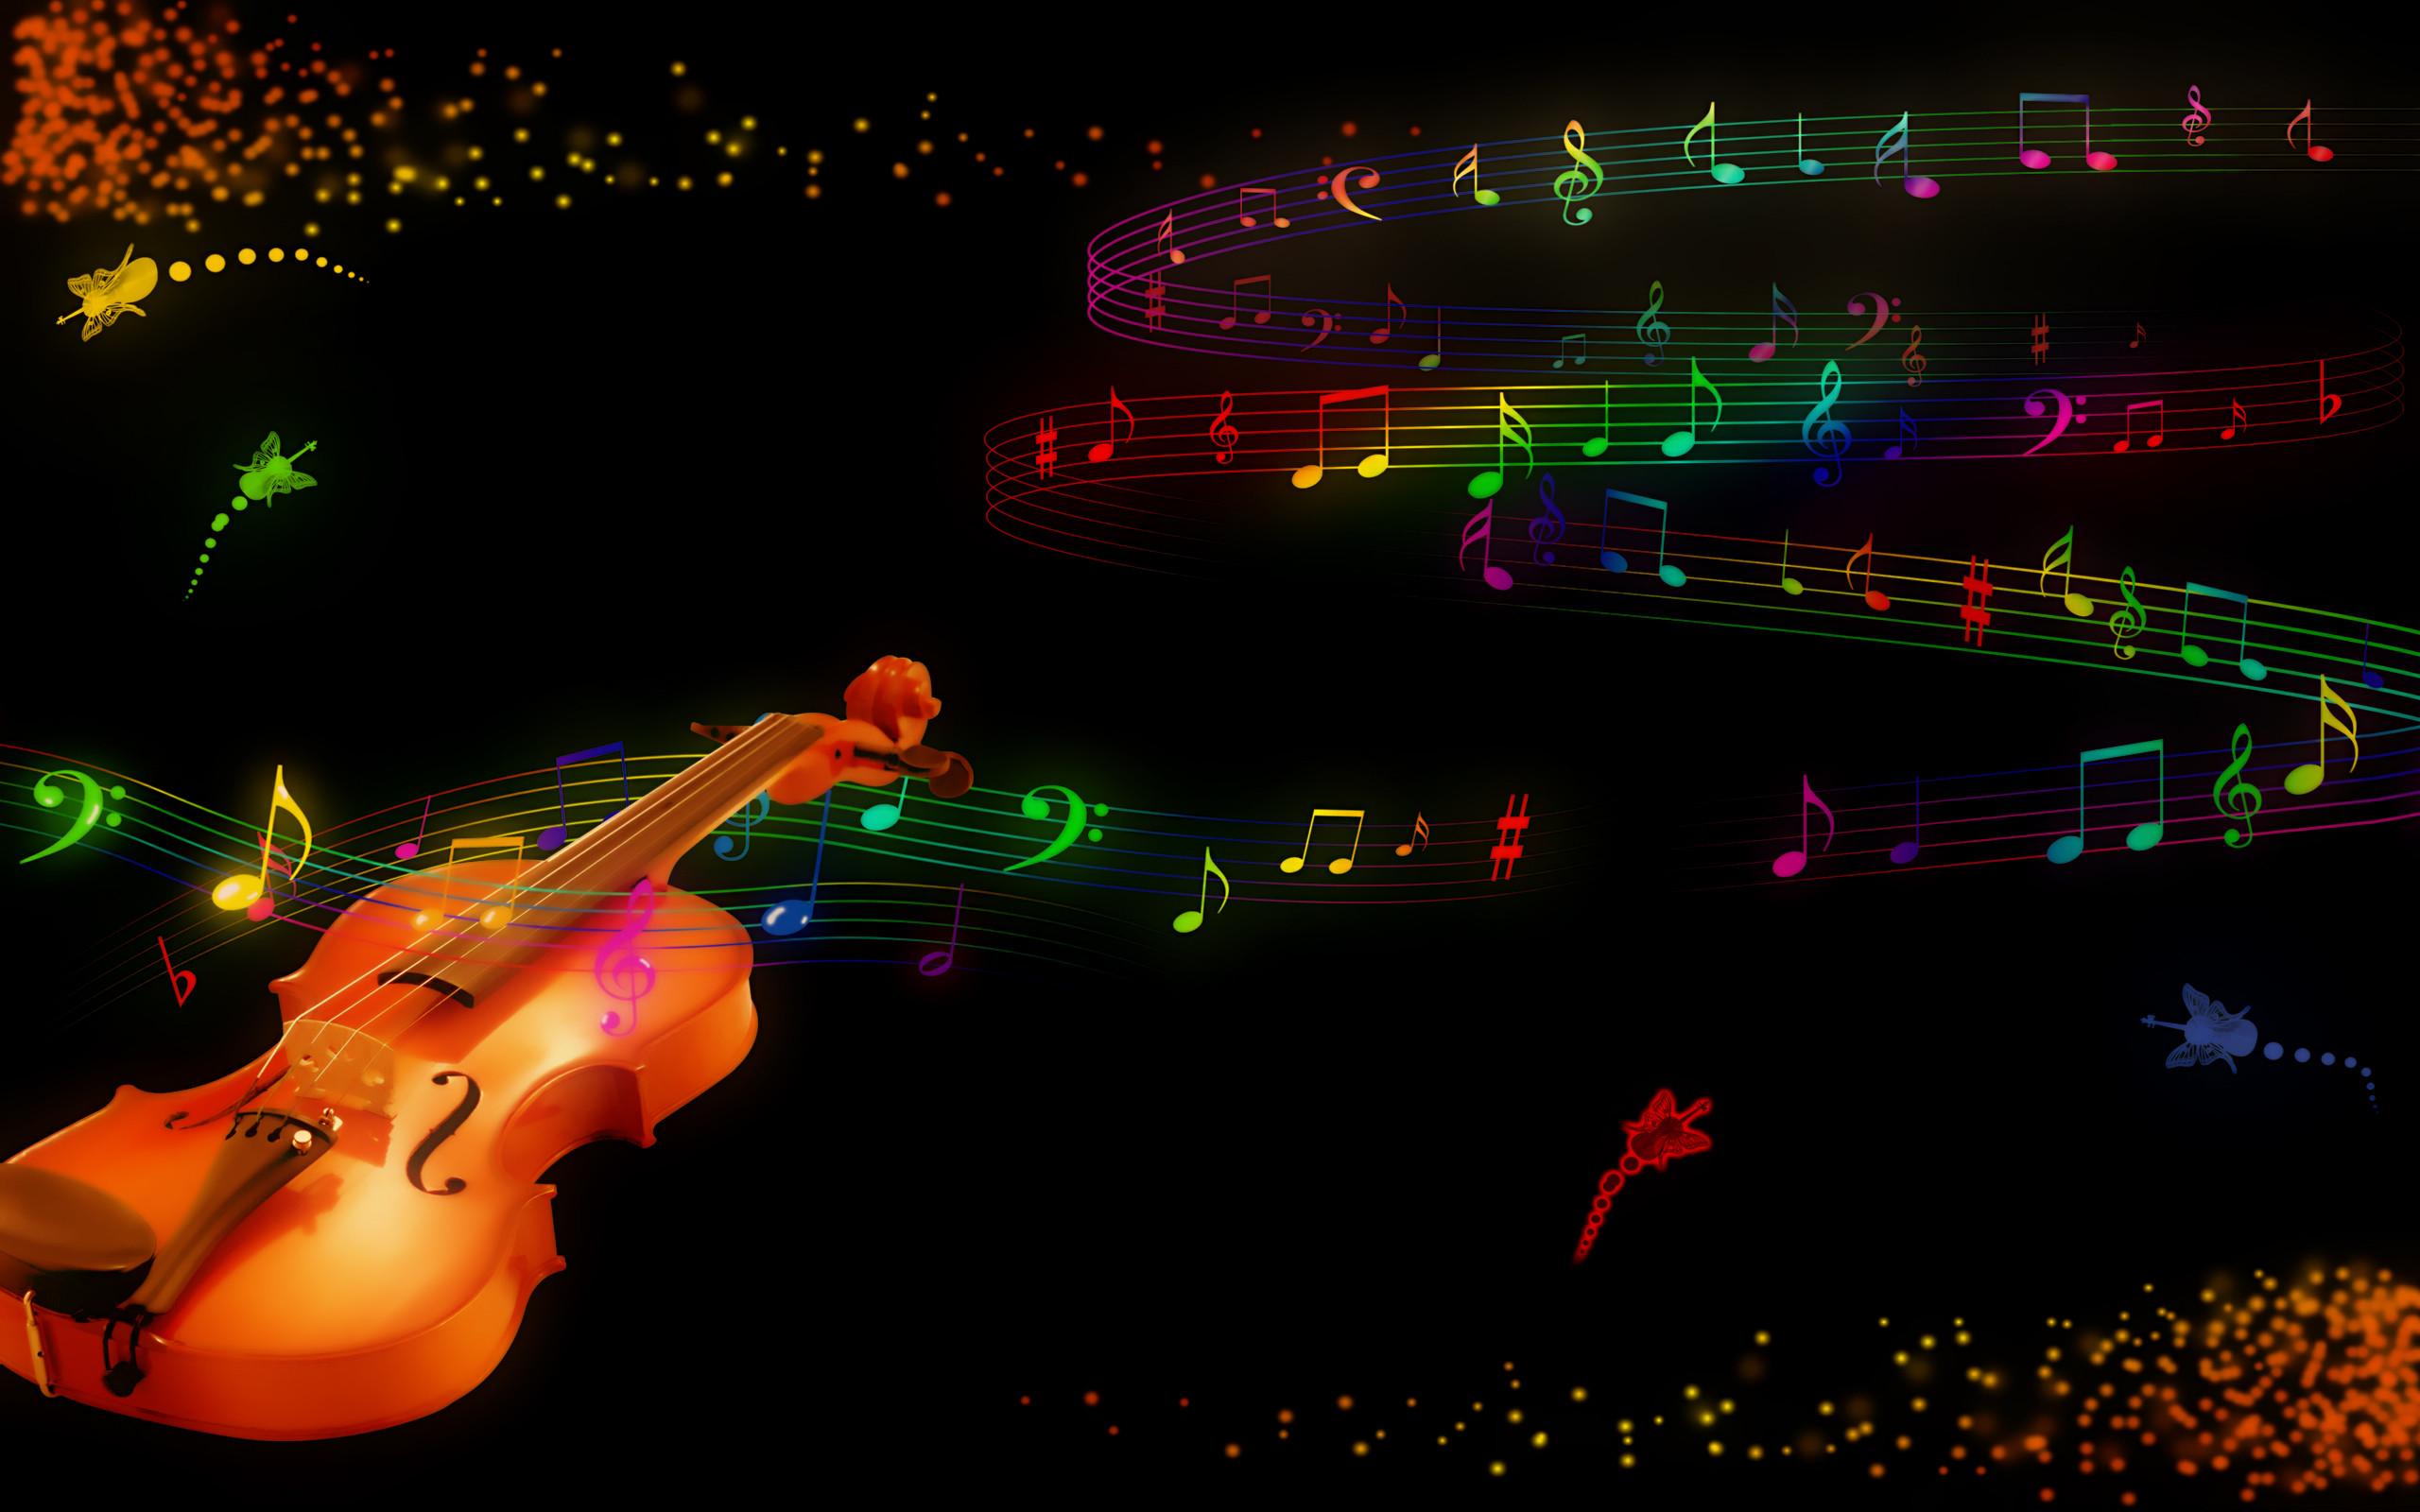 Violin and Music Wallpaper